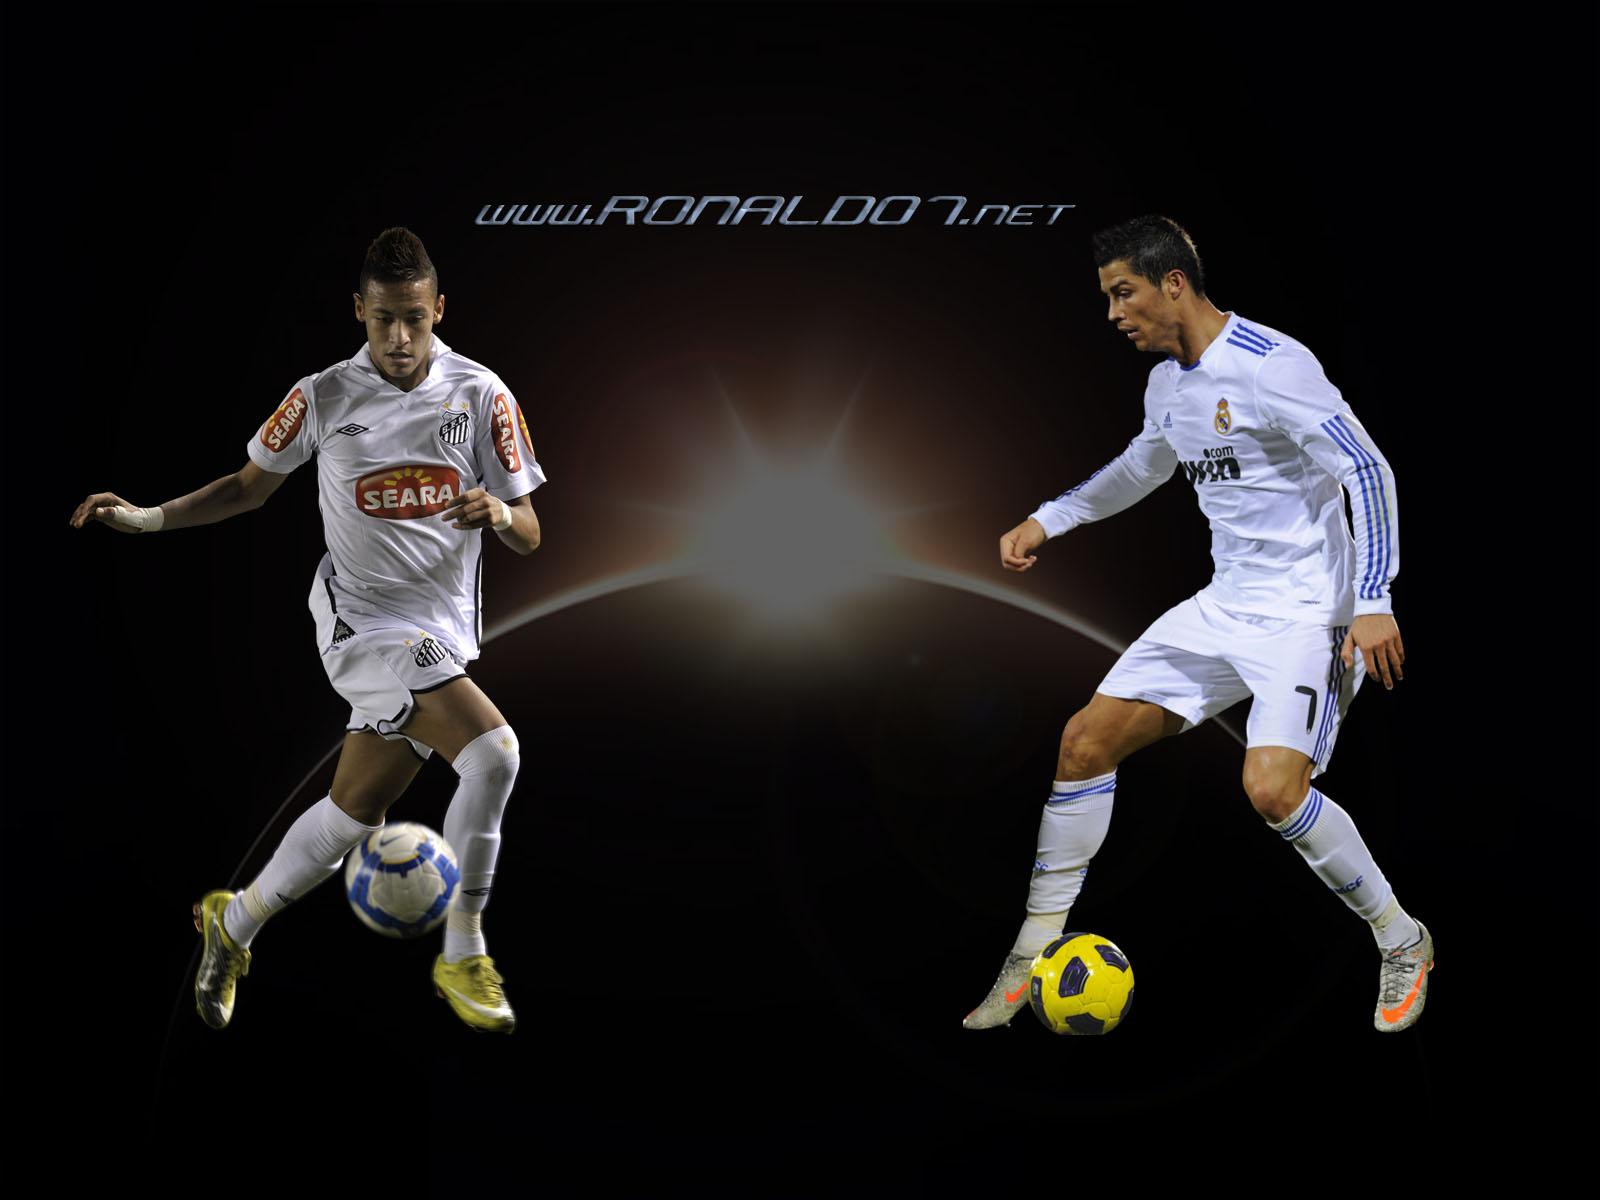 Cristiano Ronaldo And Neymar Wallpaper Take Wallpaper 1600x1200